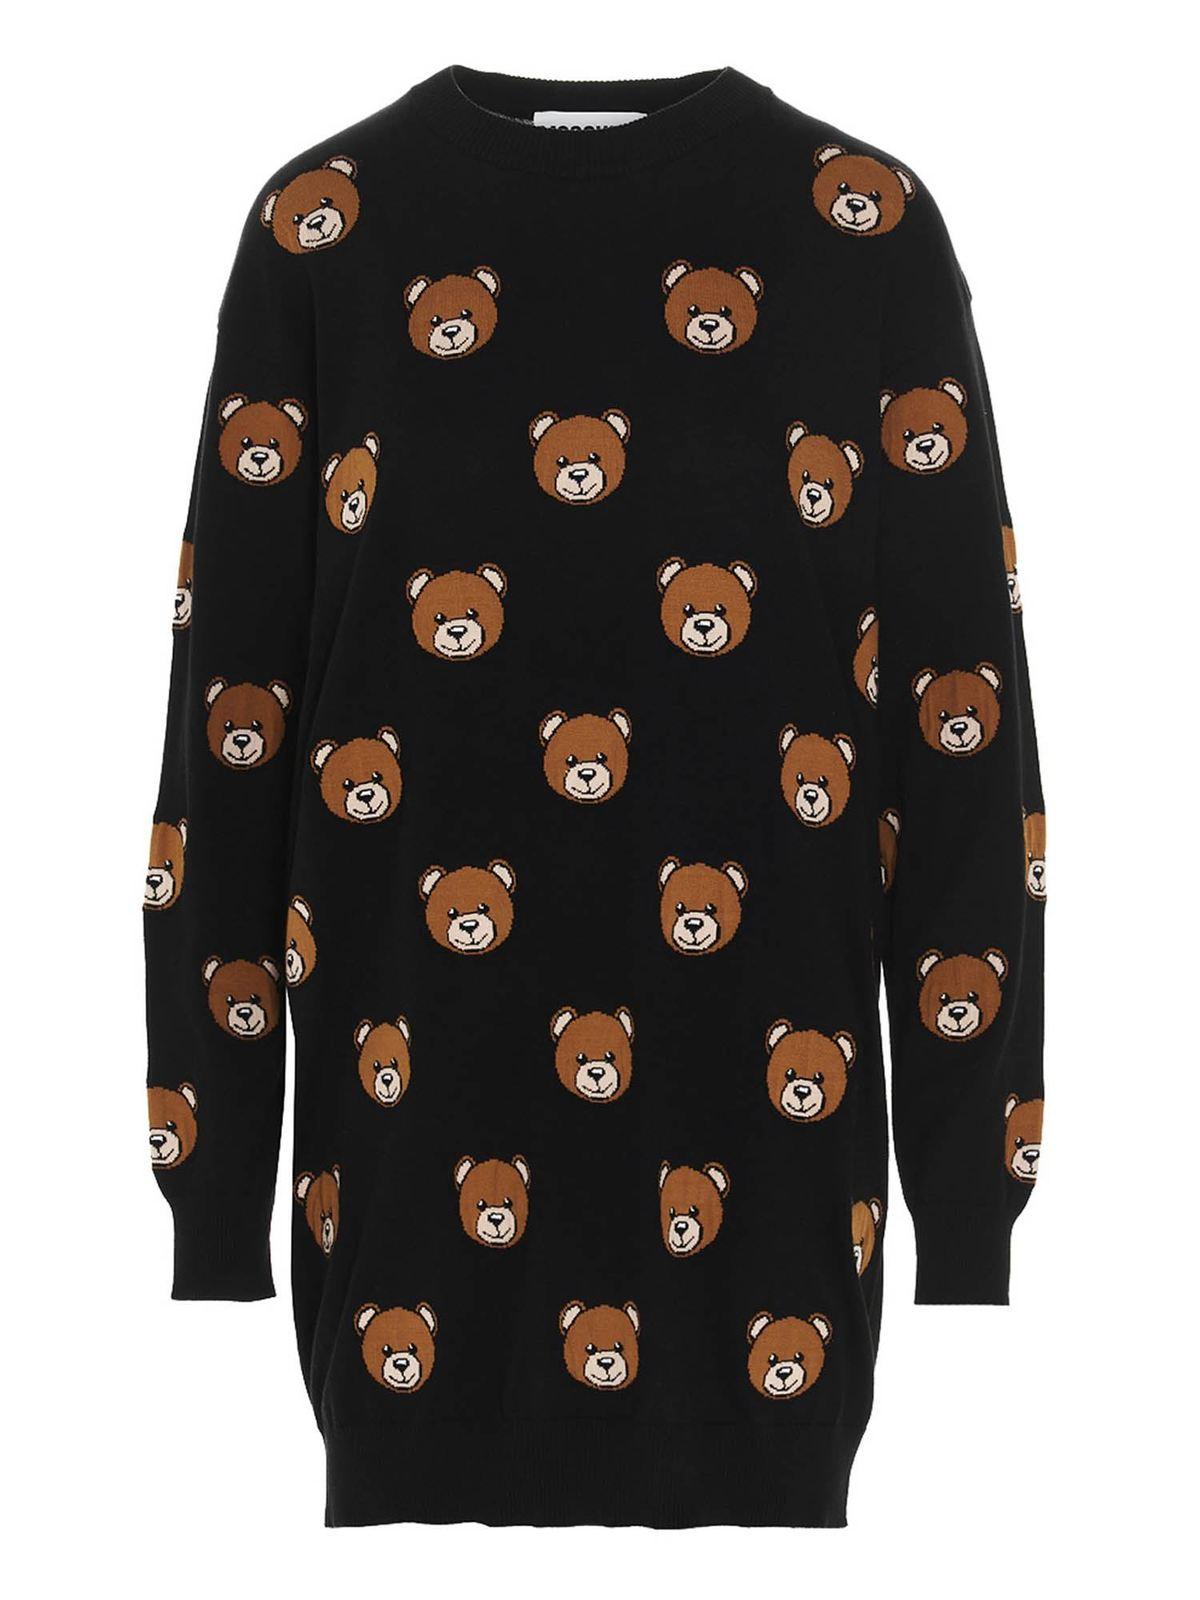 Moschino TEDDY BEAR ALL-OVER SHORT DRESS IN BLACK